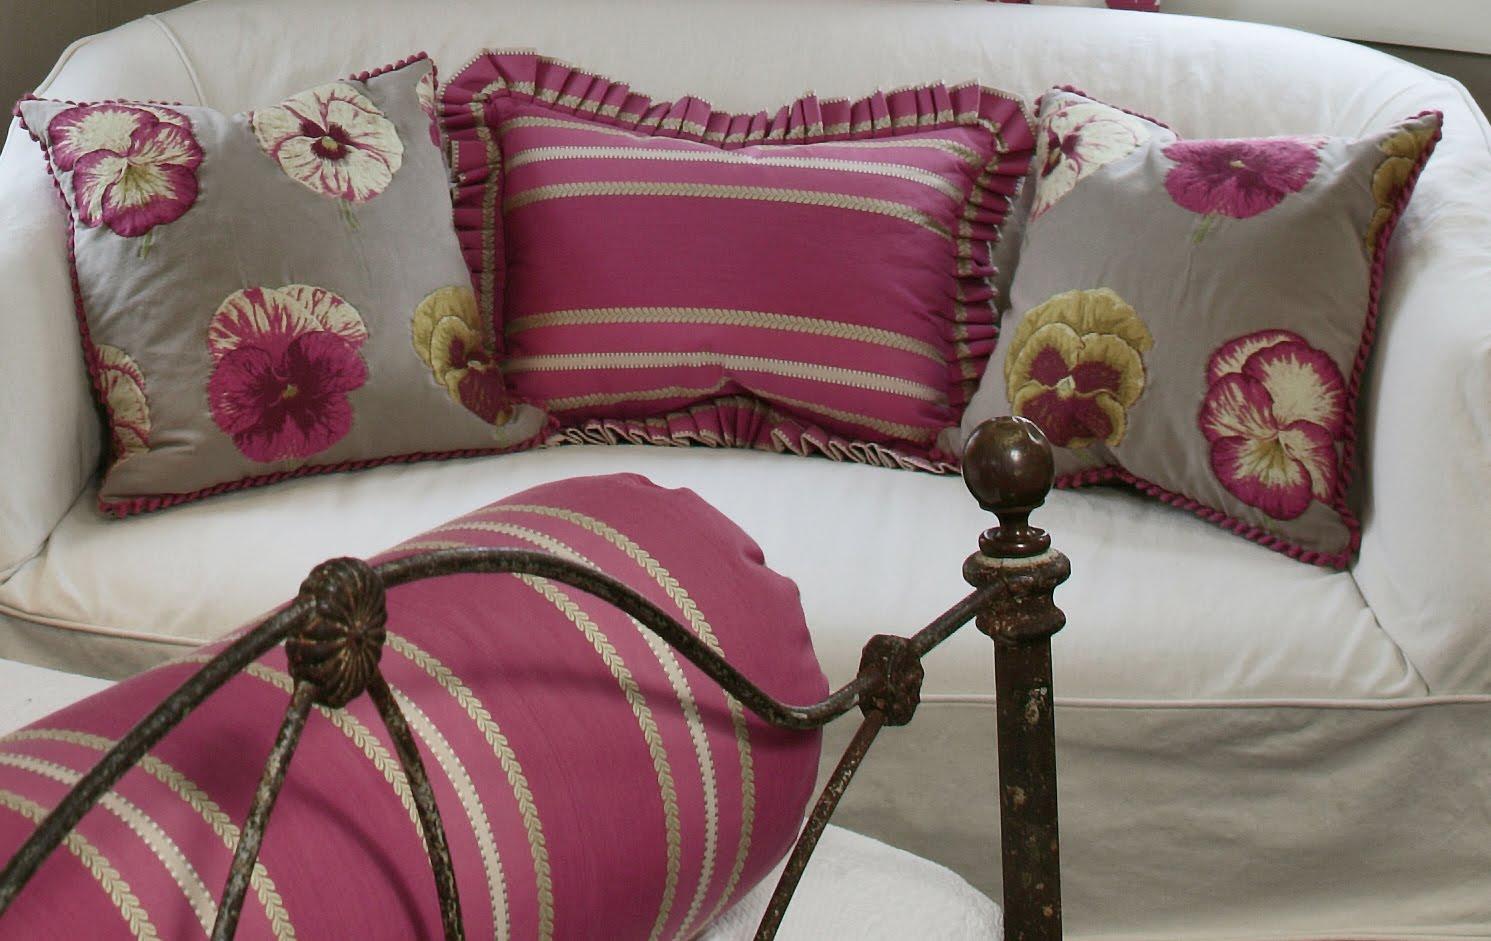 http://3.bp.blogspot.com/_kSroCbdNCC4/THQjMzEVfHI/AAAAAAAADoc/pZm3Jwgqyco/s1600/Andy%27s_rm_1+pillows(Abbott).jpg